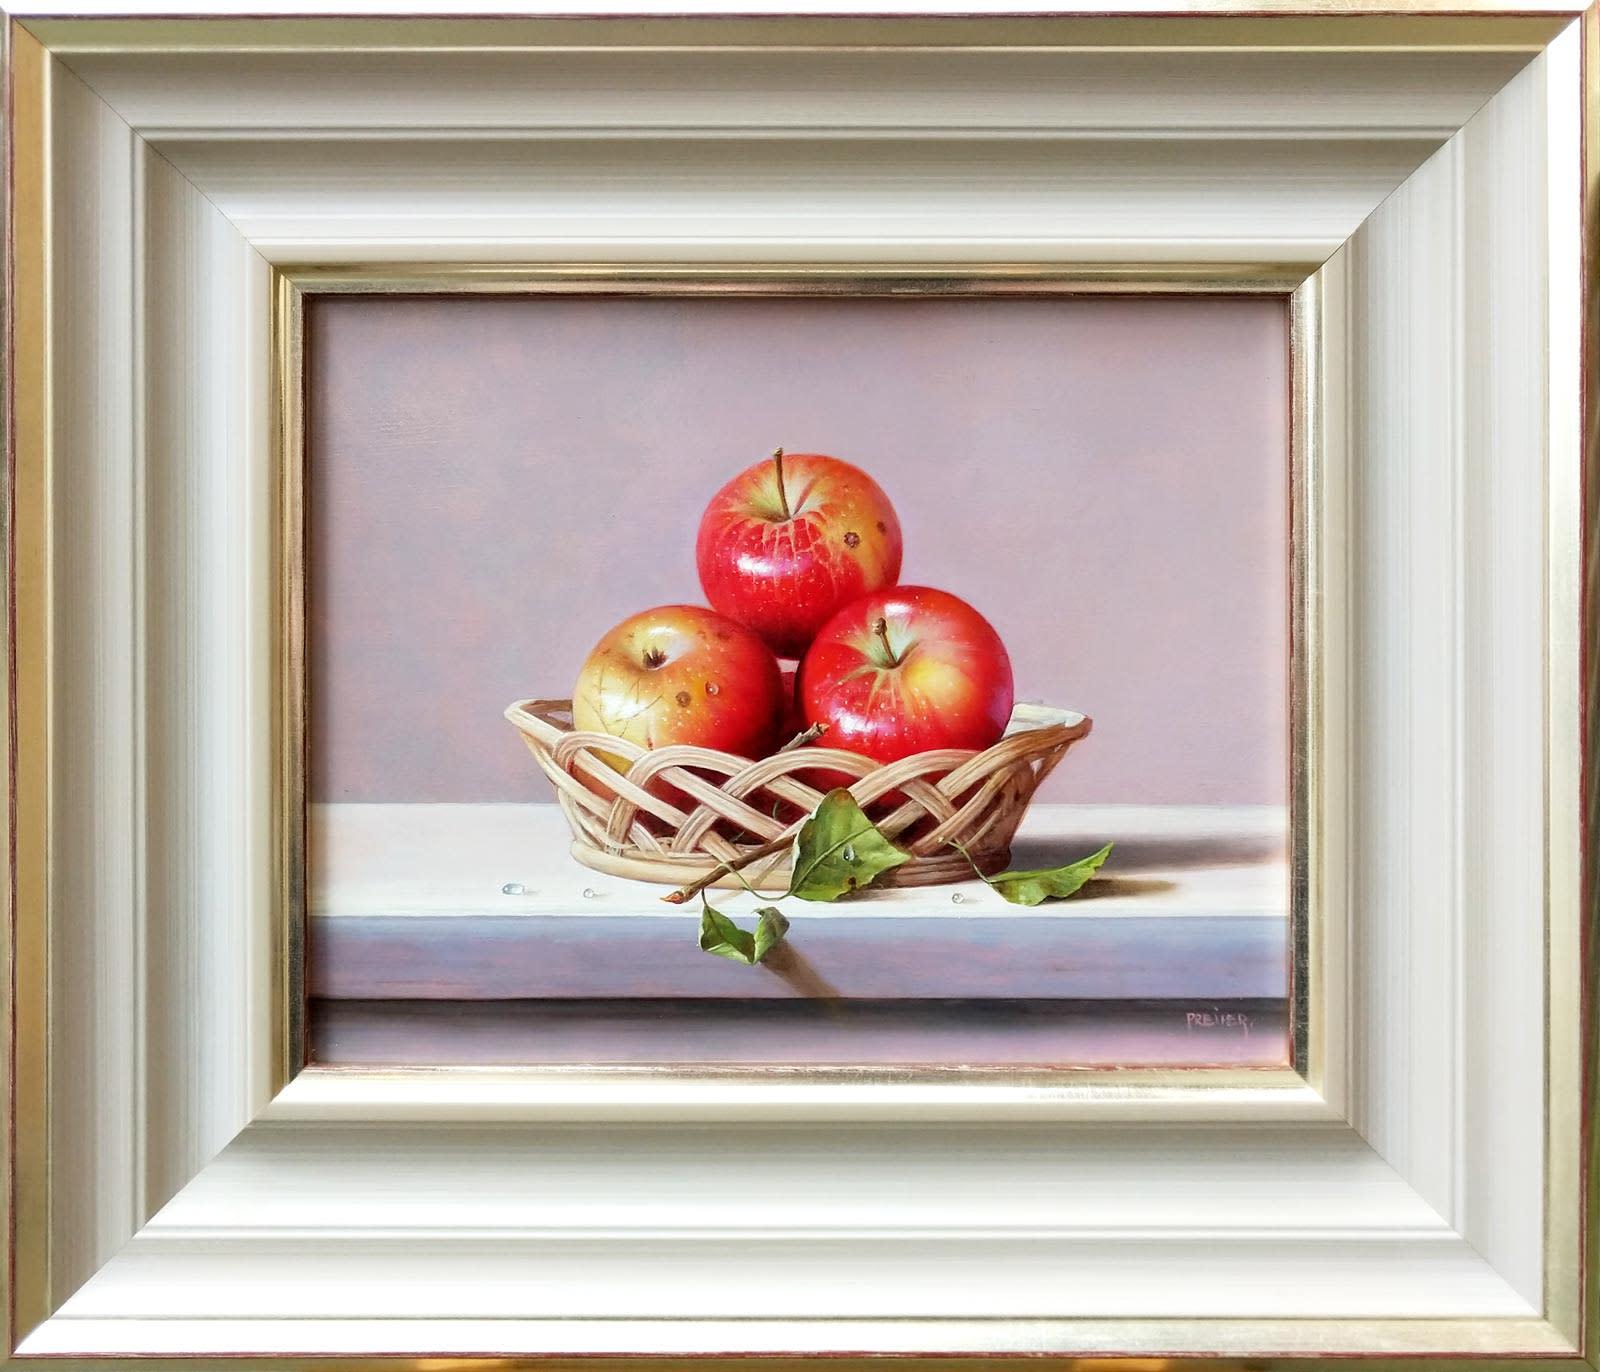 Basket of Apples, Zoltan Preiner